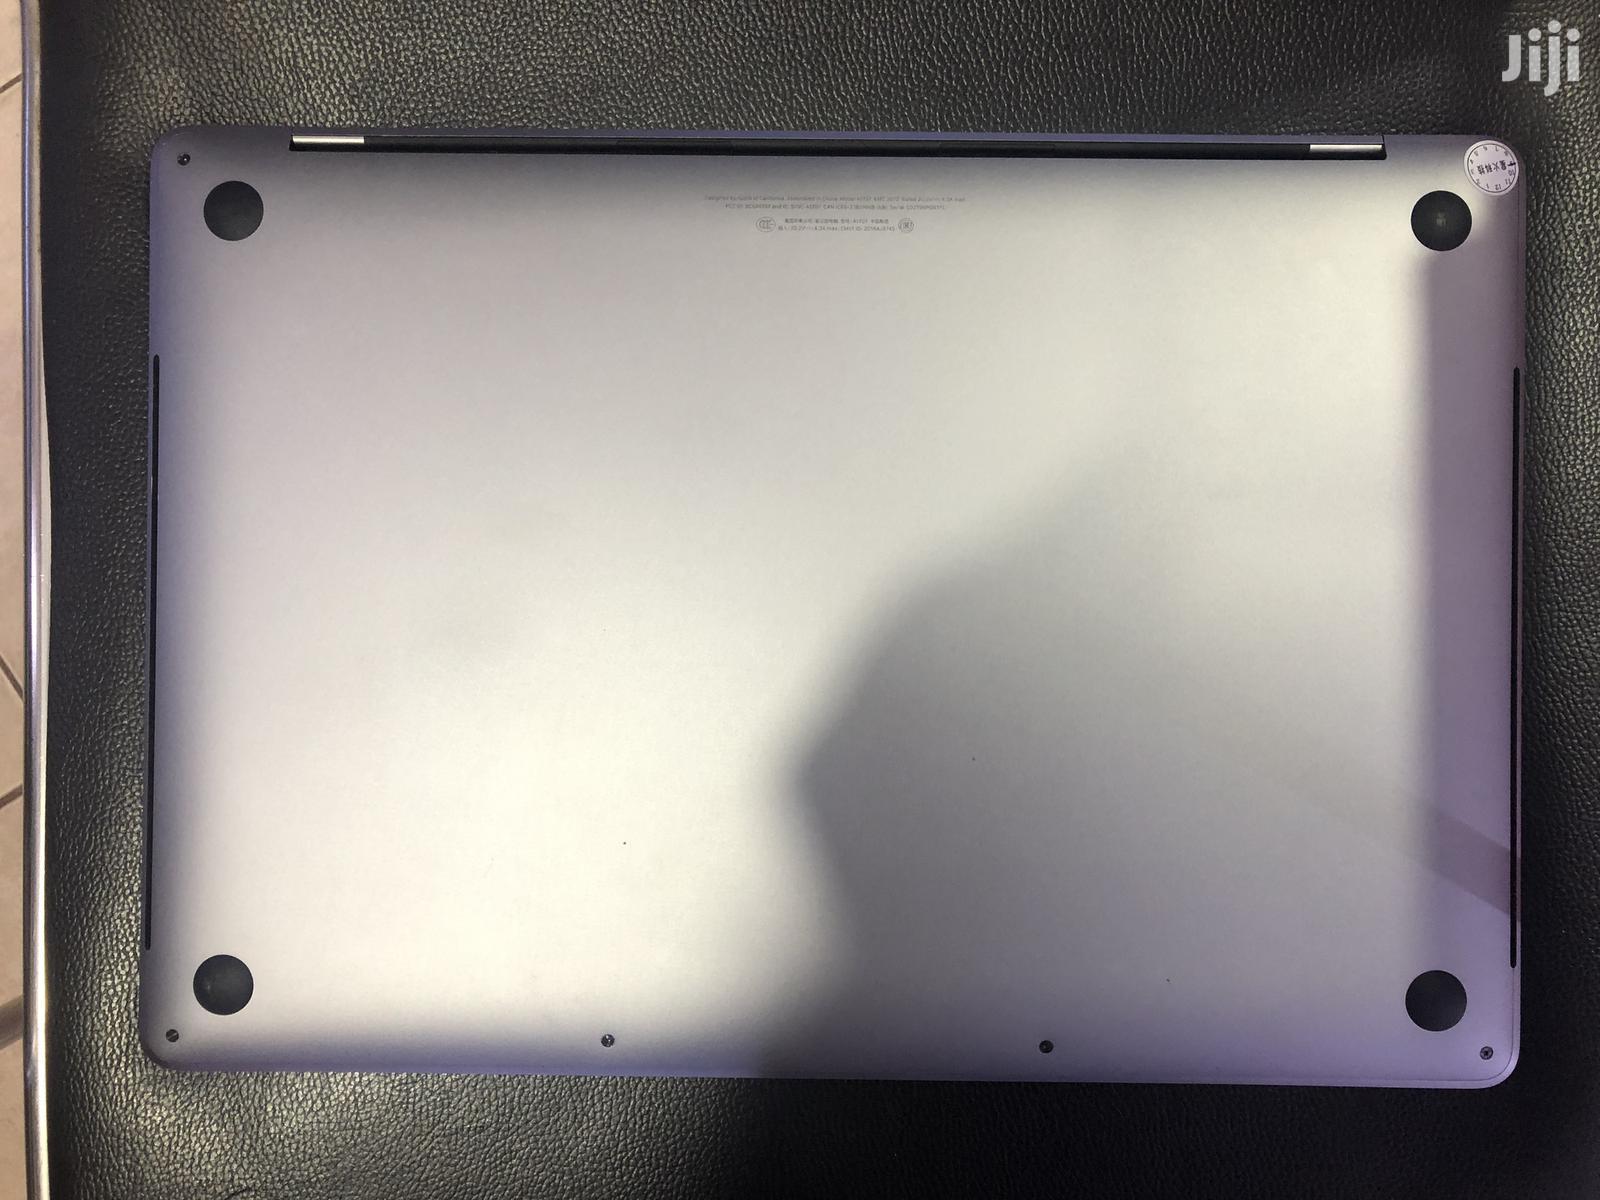 Laptop Apple MacBook Pro 16GB Intel Core i7 SSD 256GB | Laptops & Computers for sale in Kampala, Central Region, Uganda